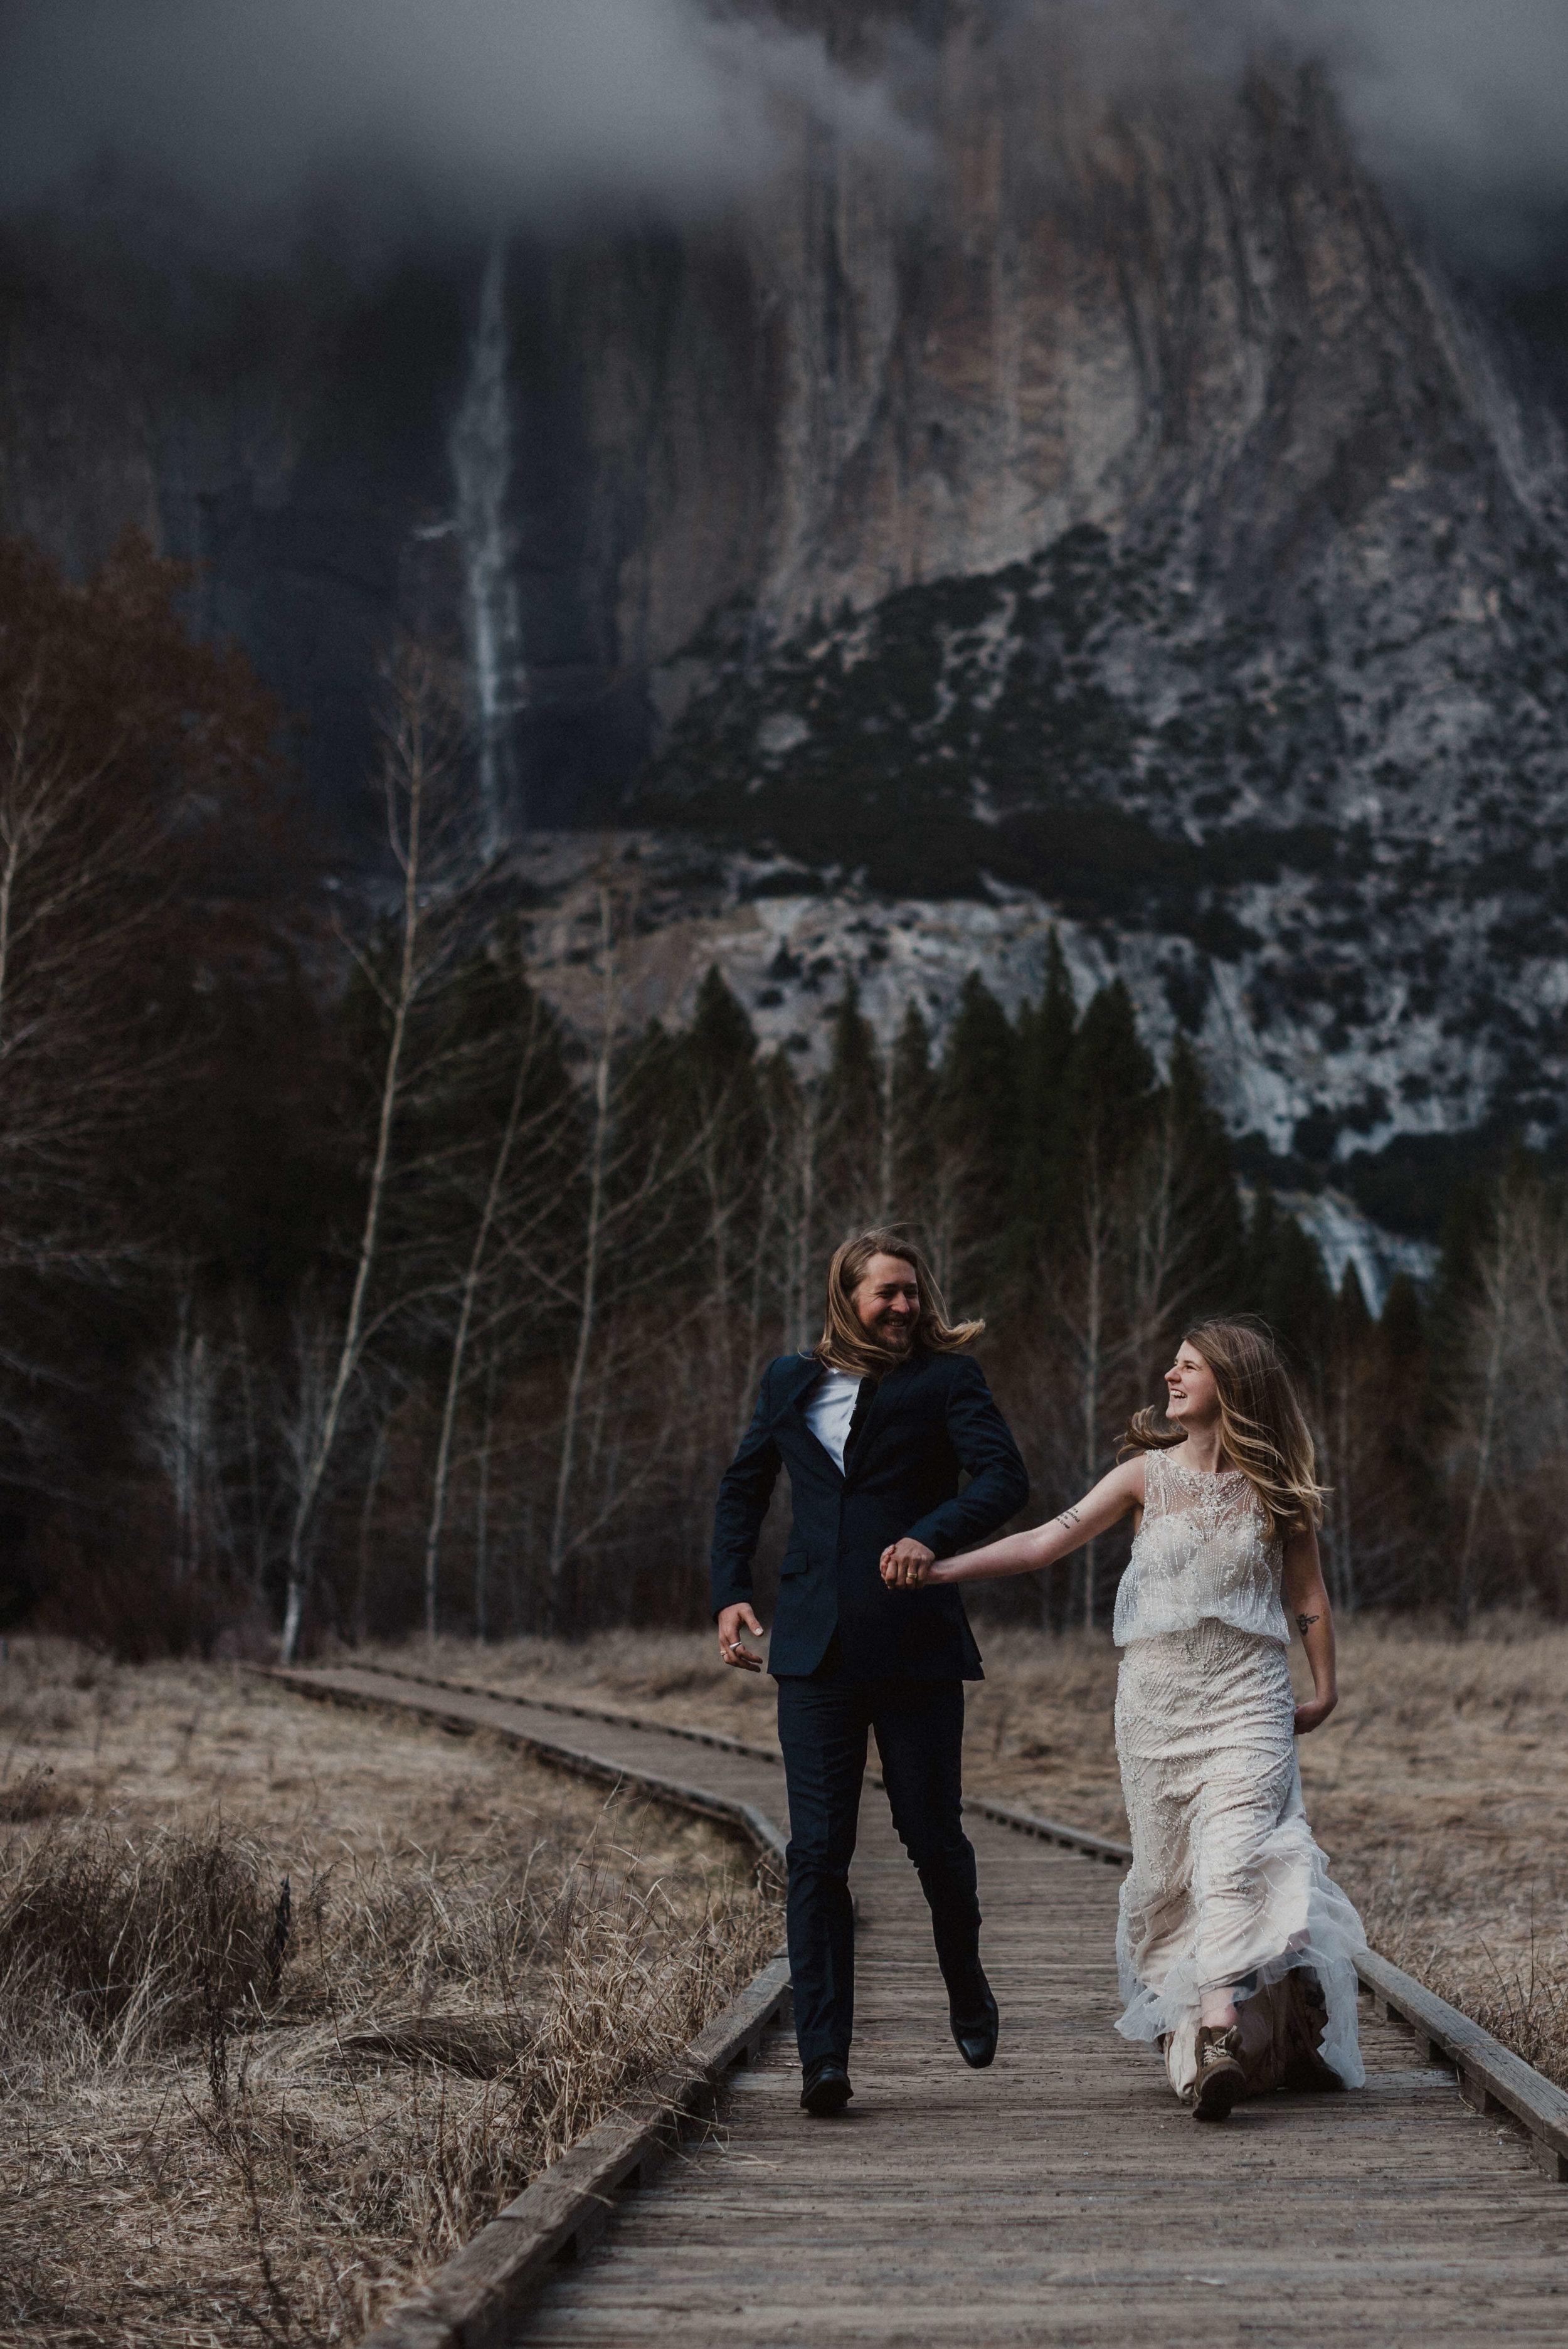 Adventure-Elopement-Yosemite-Valley-30.jpg